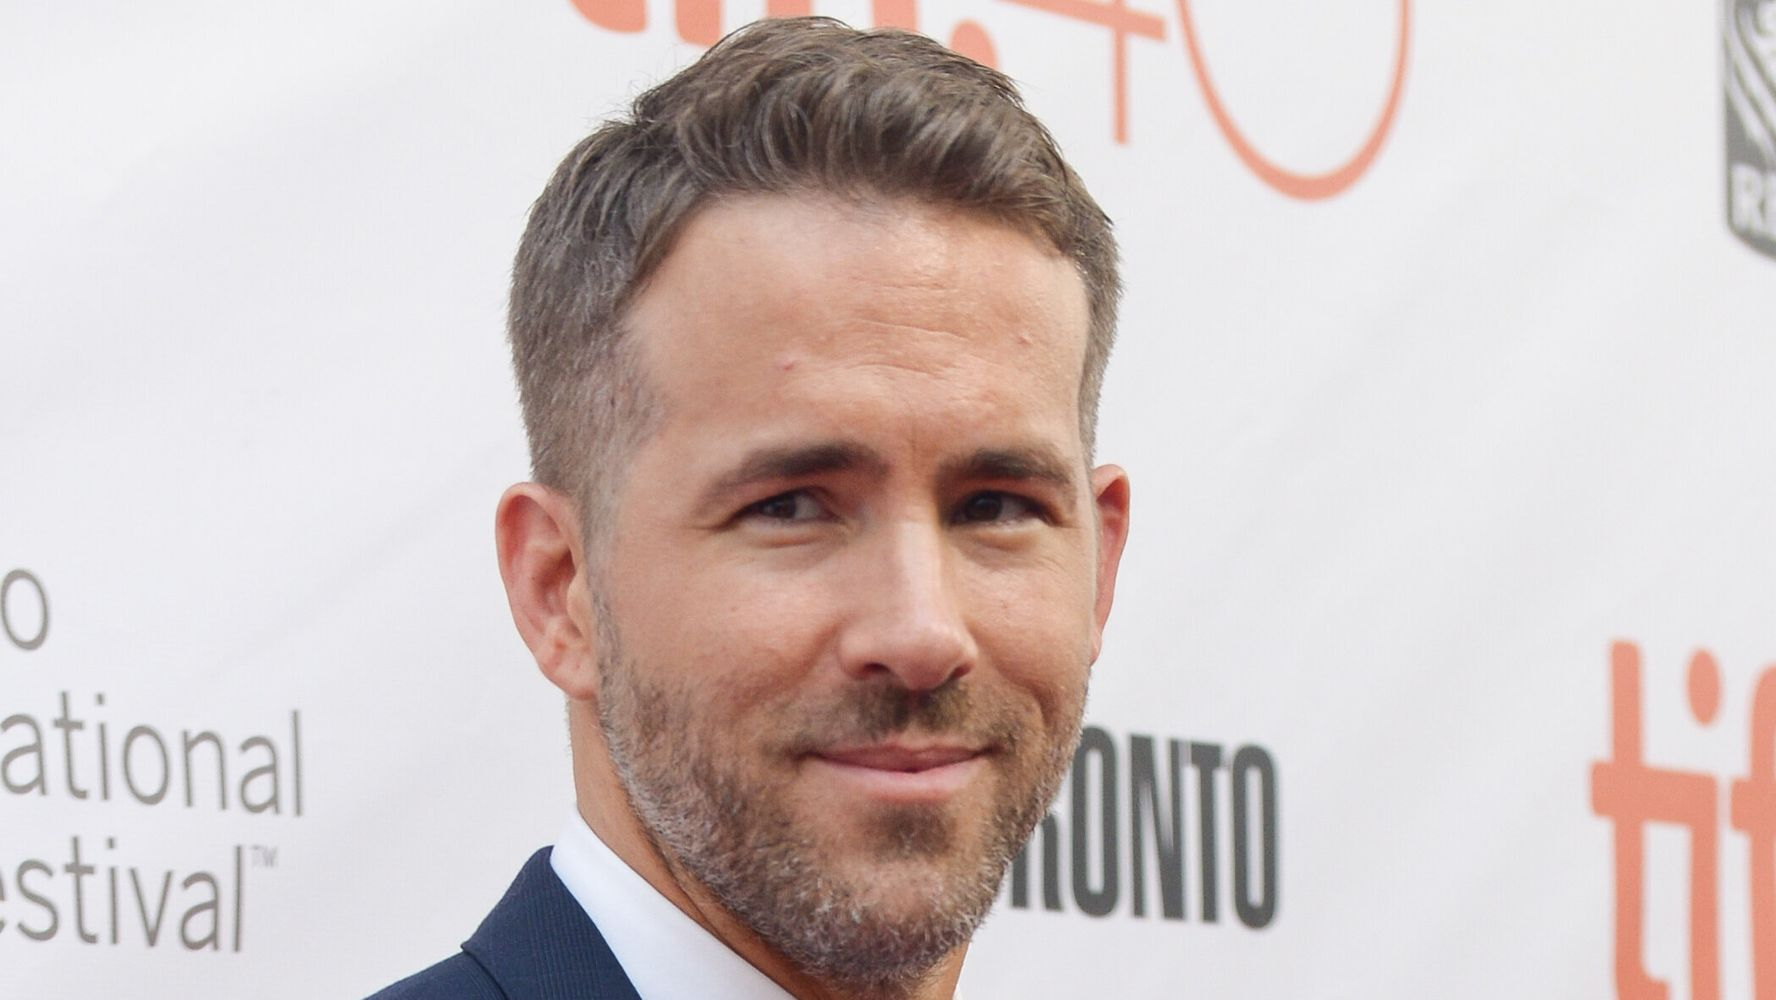 Ryan Reynolds Honours His Mountie Brother, Barenaked Ladies' Steven Page